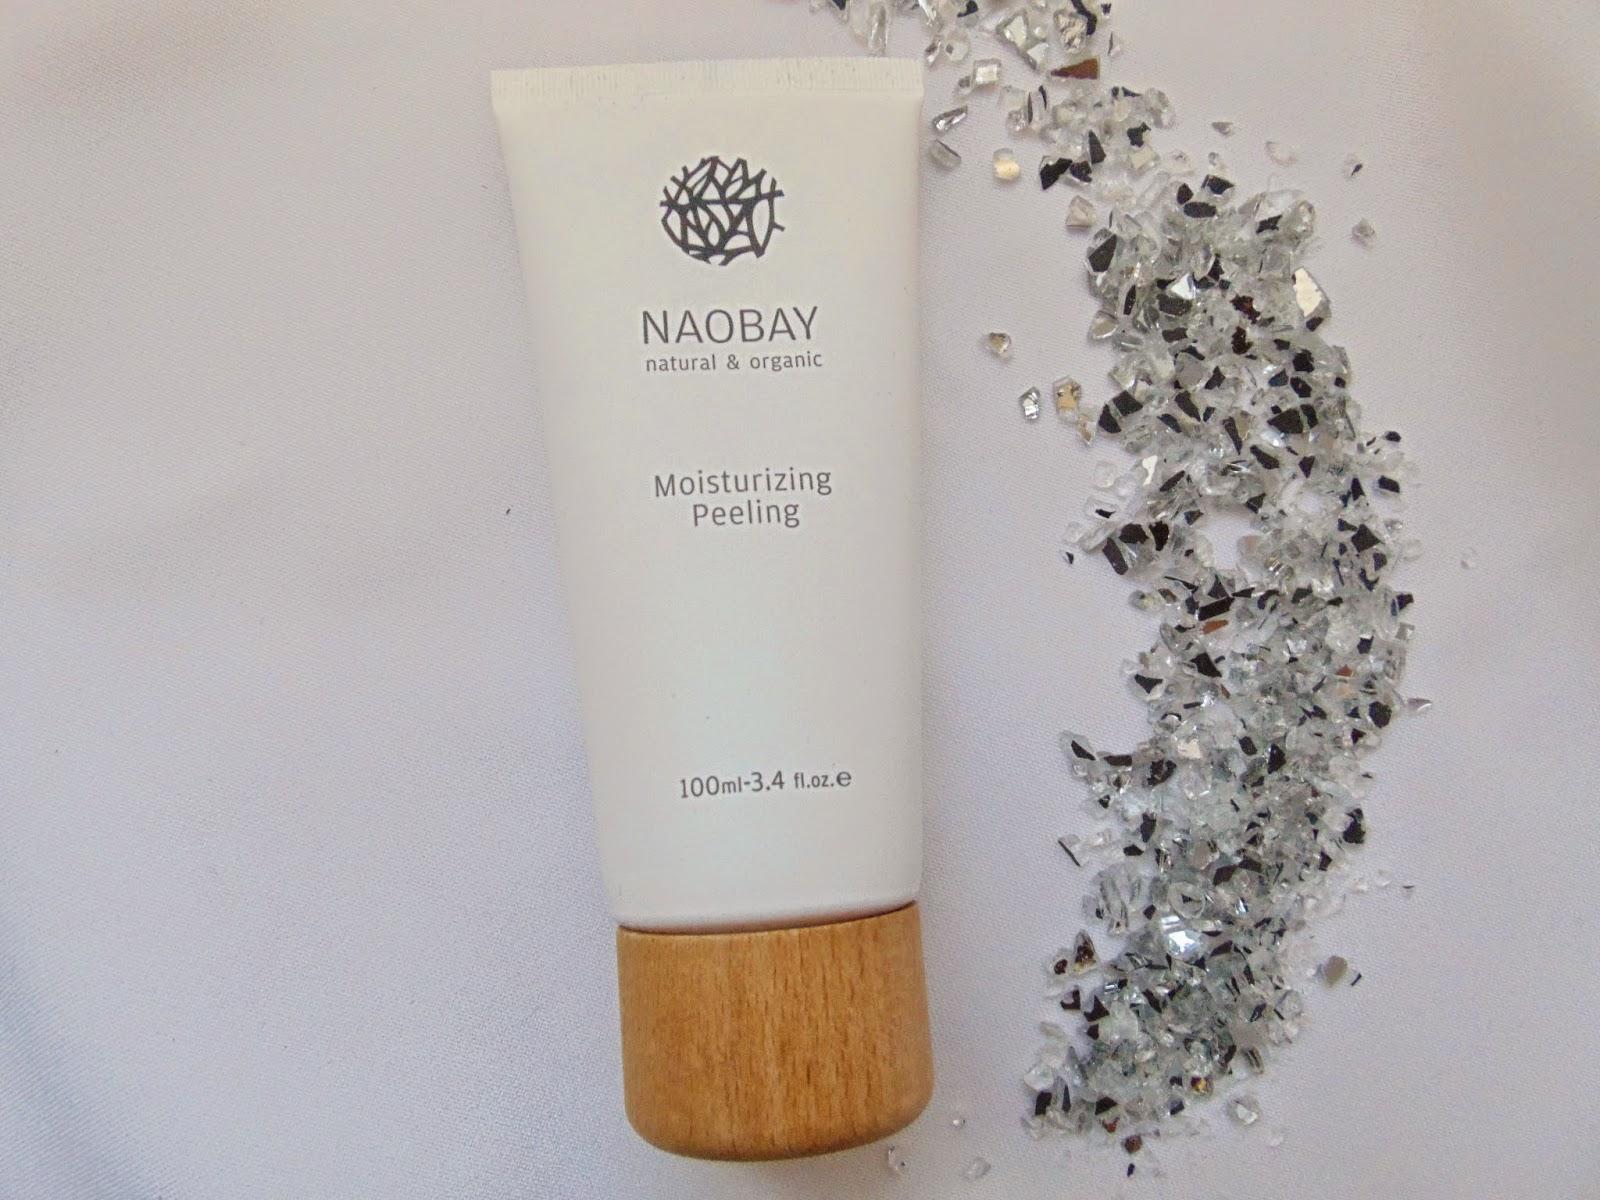 Naobay - Natural & Organic - Moisturizing Peeling - www.annitschkasblog.de